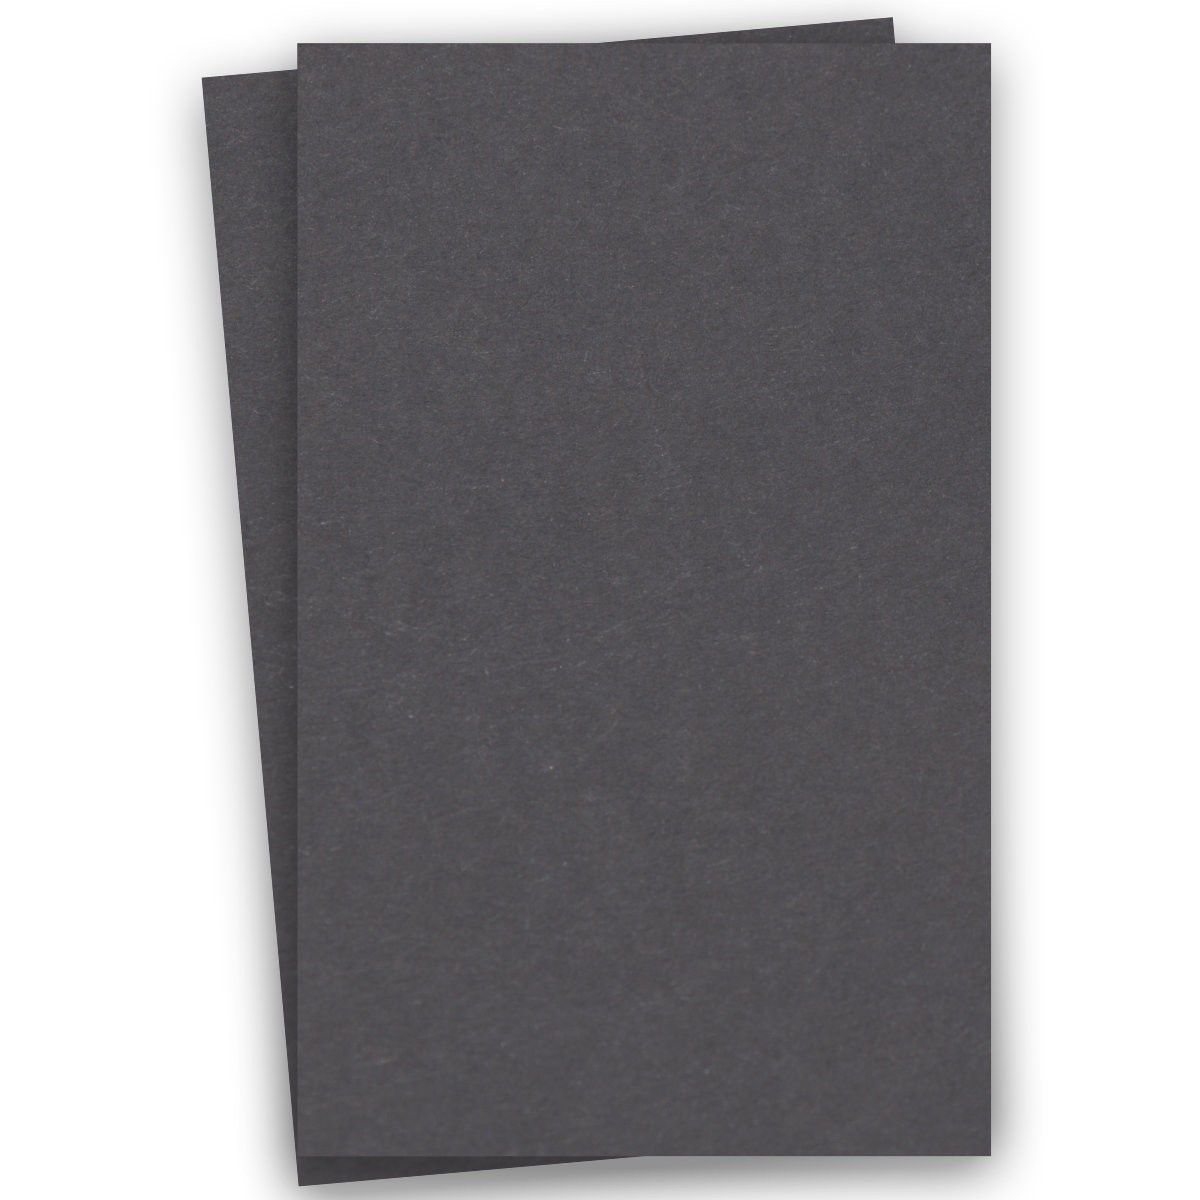 Basis Colors 11 X 17 Cardstock Paper Grey 80lb Cover 100 Pk In 2021 Cover Paper Cardstock Paper Silkscreen